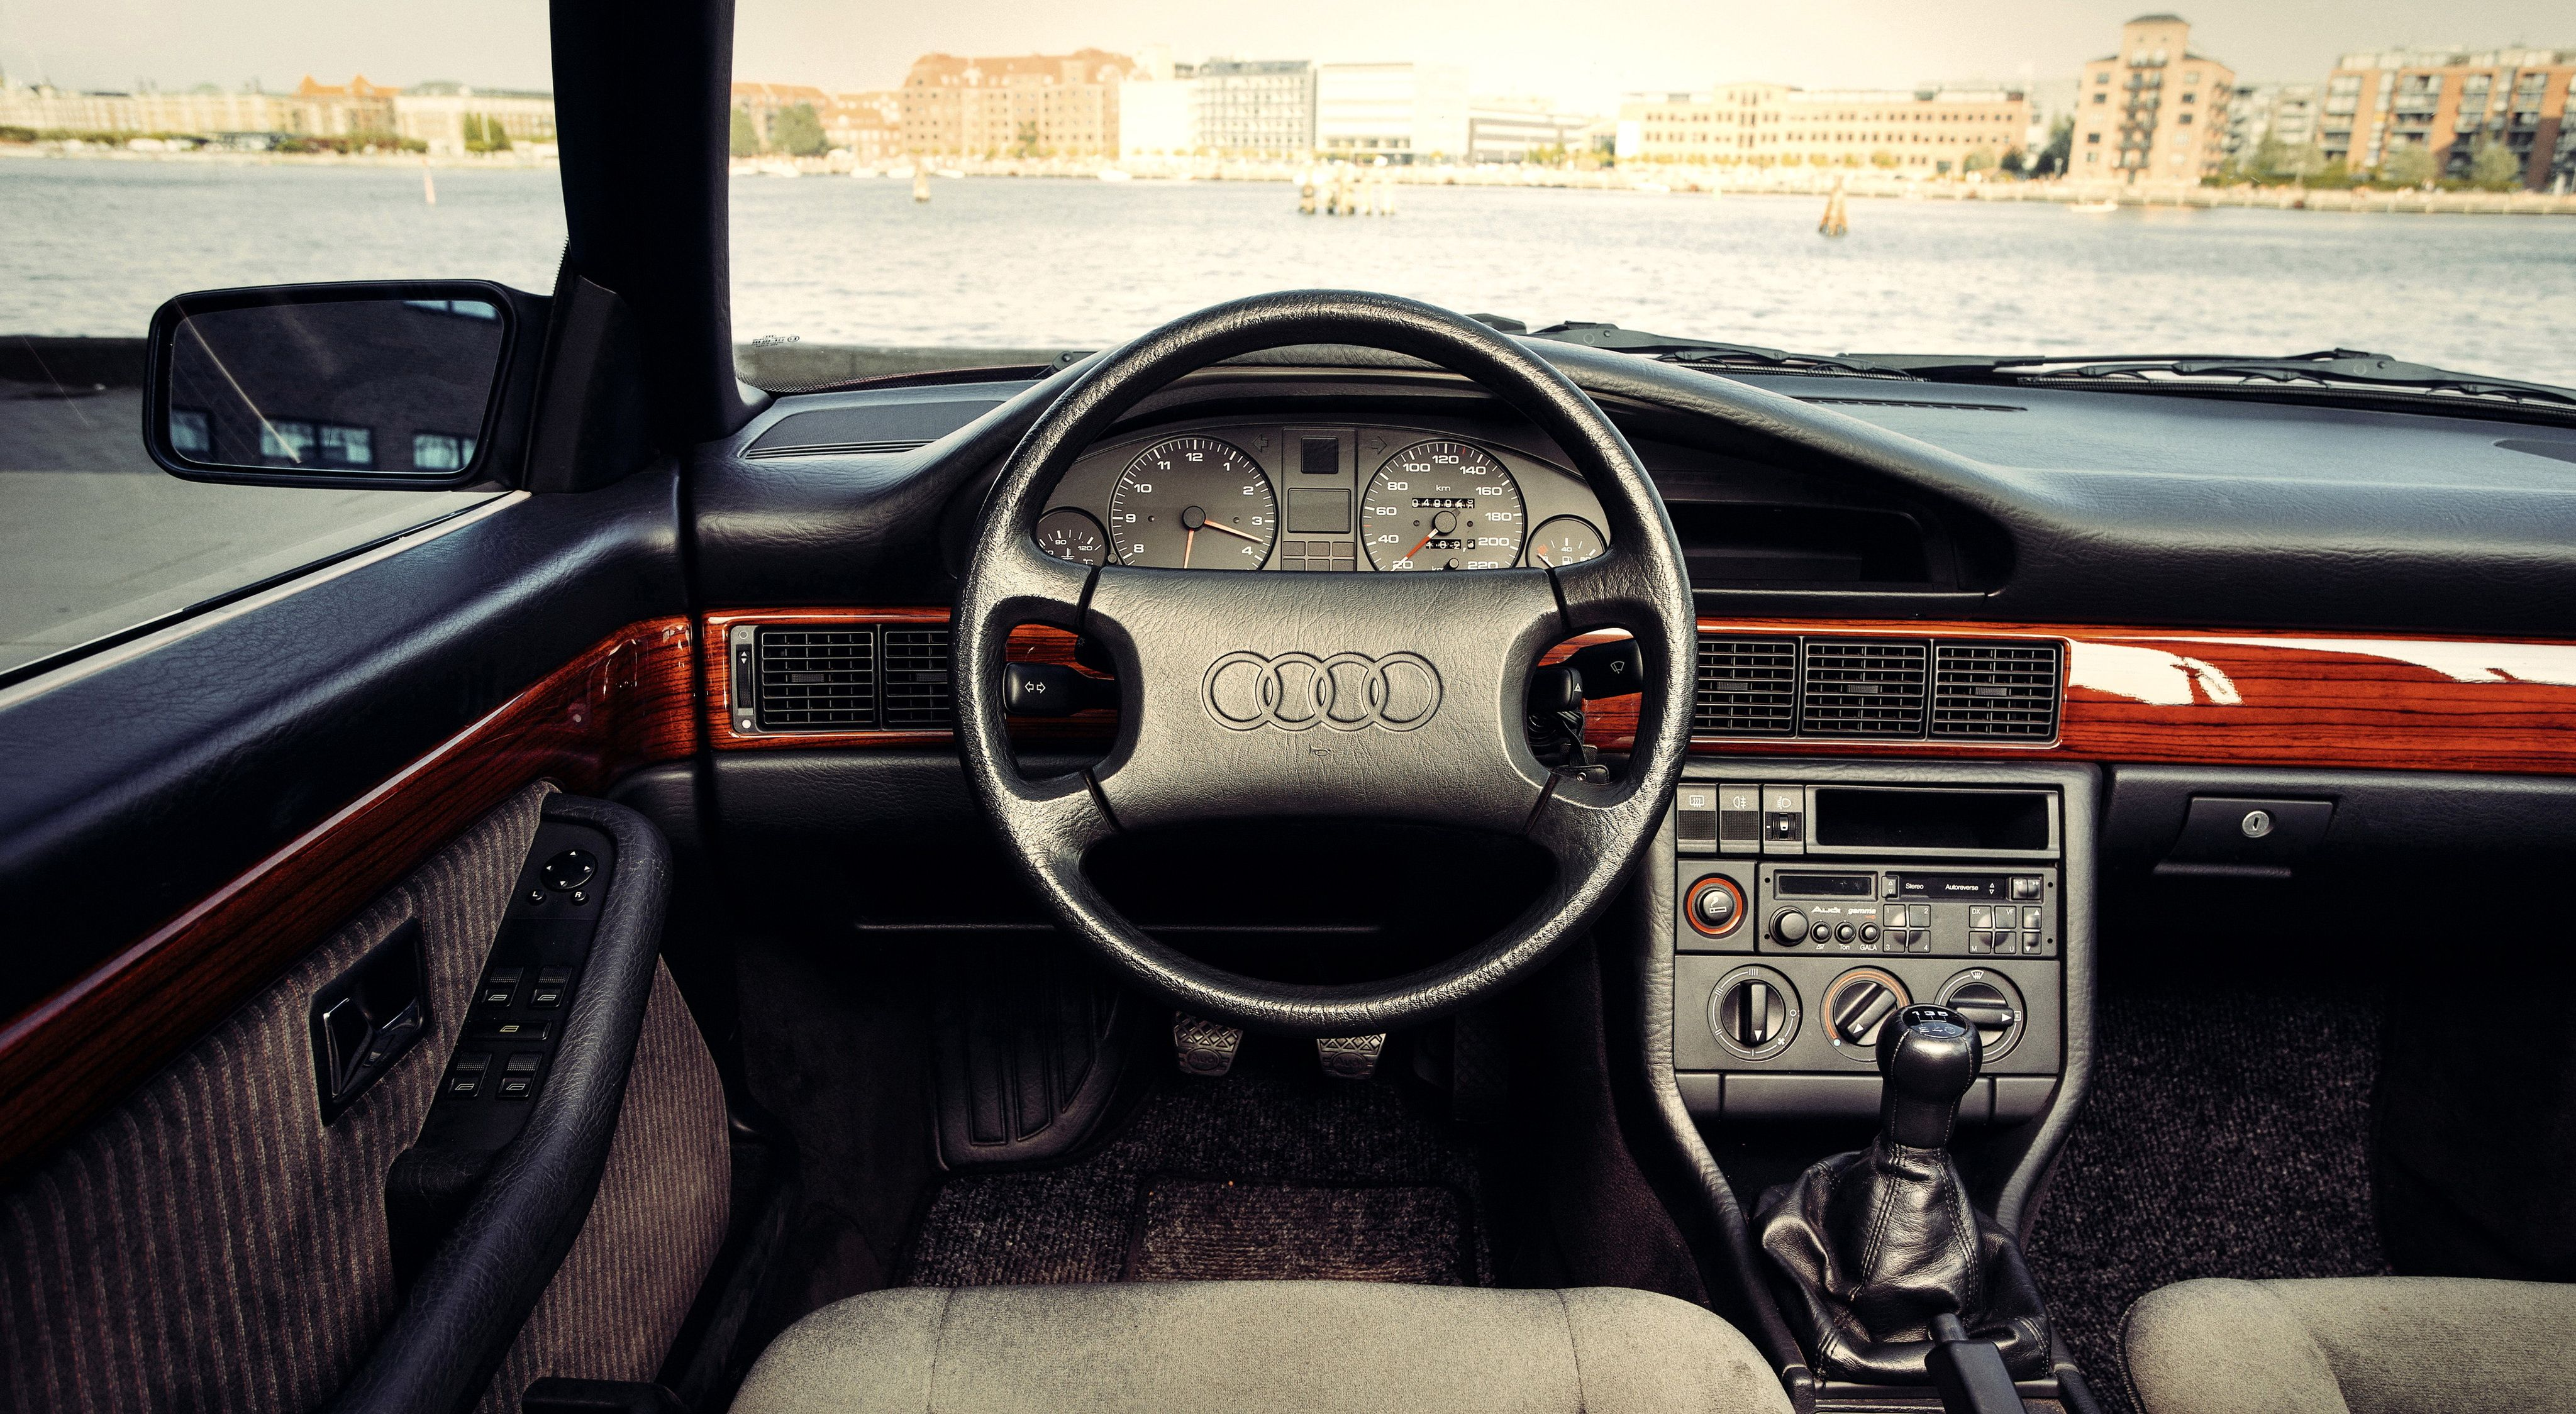 Pin on Retro Interiors Cars